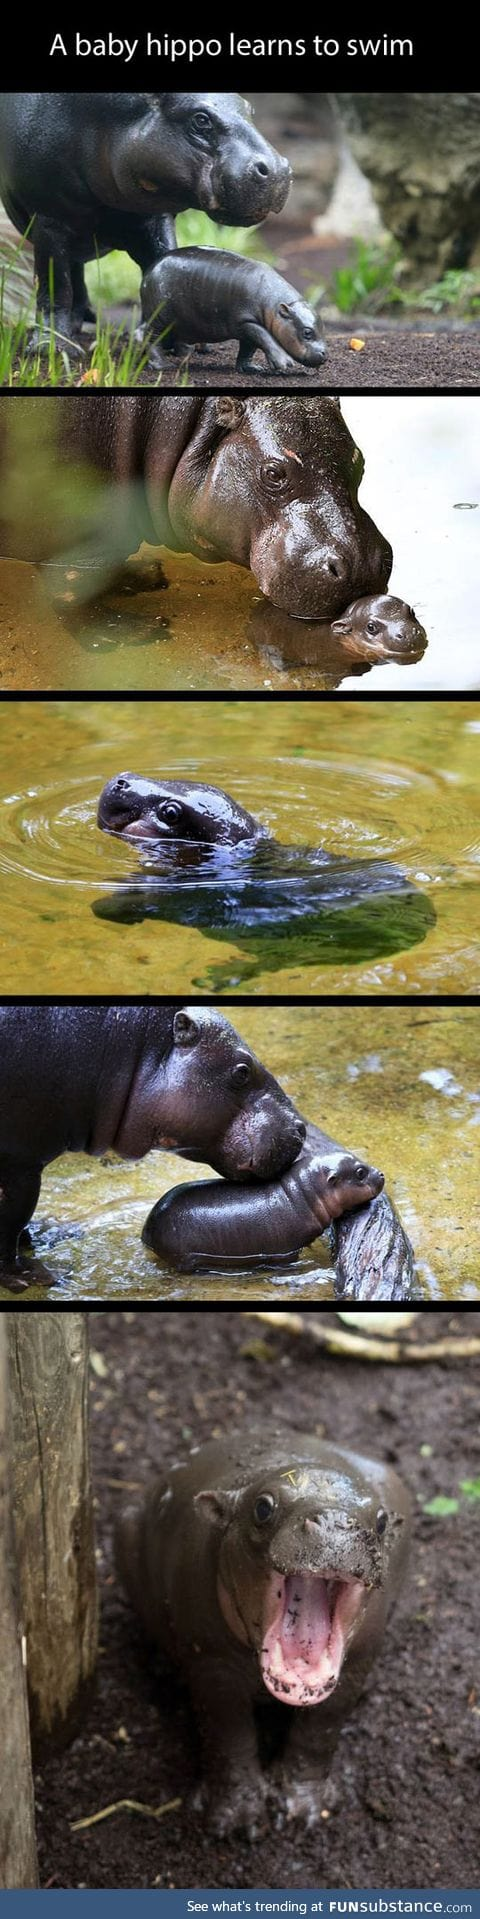 This baby hippo makes me happy